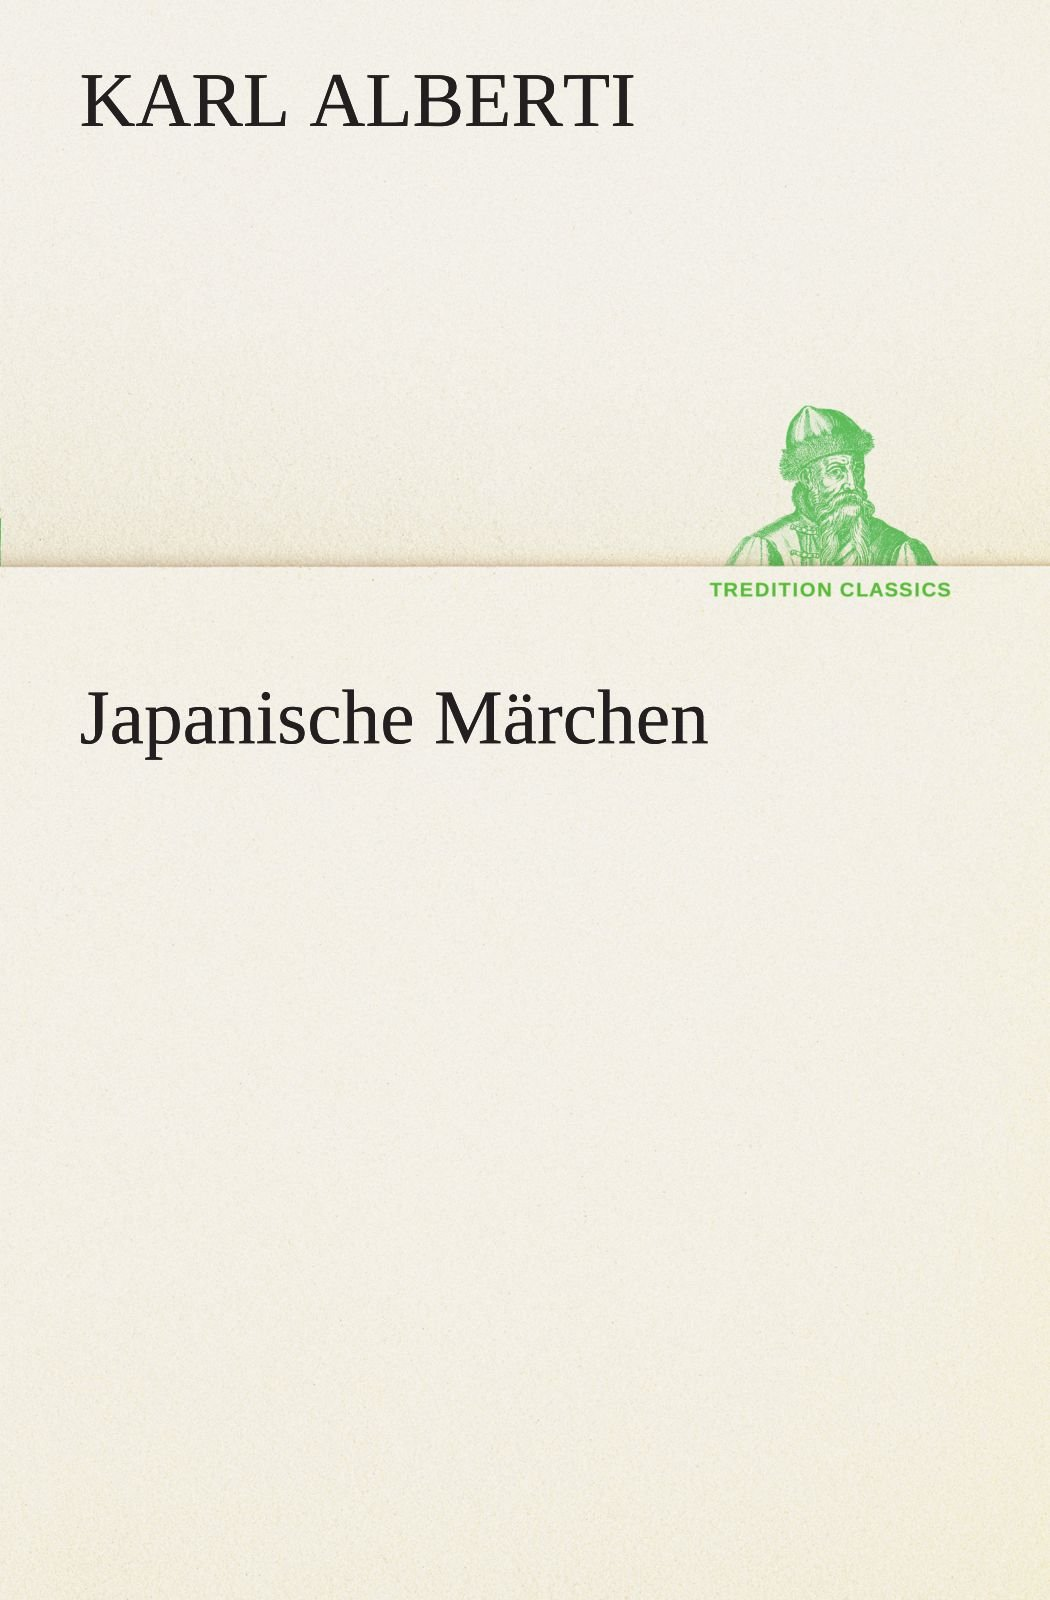 Japanische Märchen (TREDITION CLASSICS) (German Edition) pdf